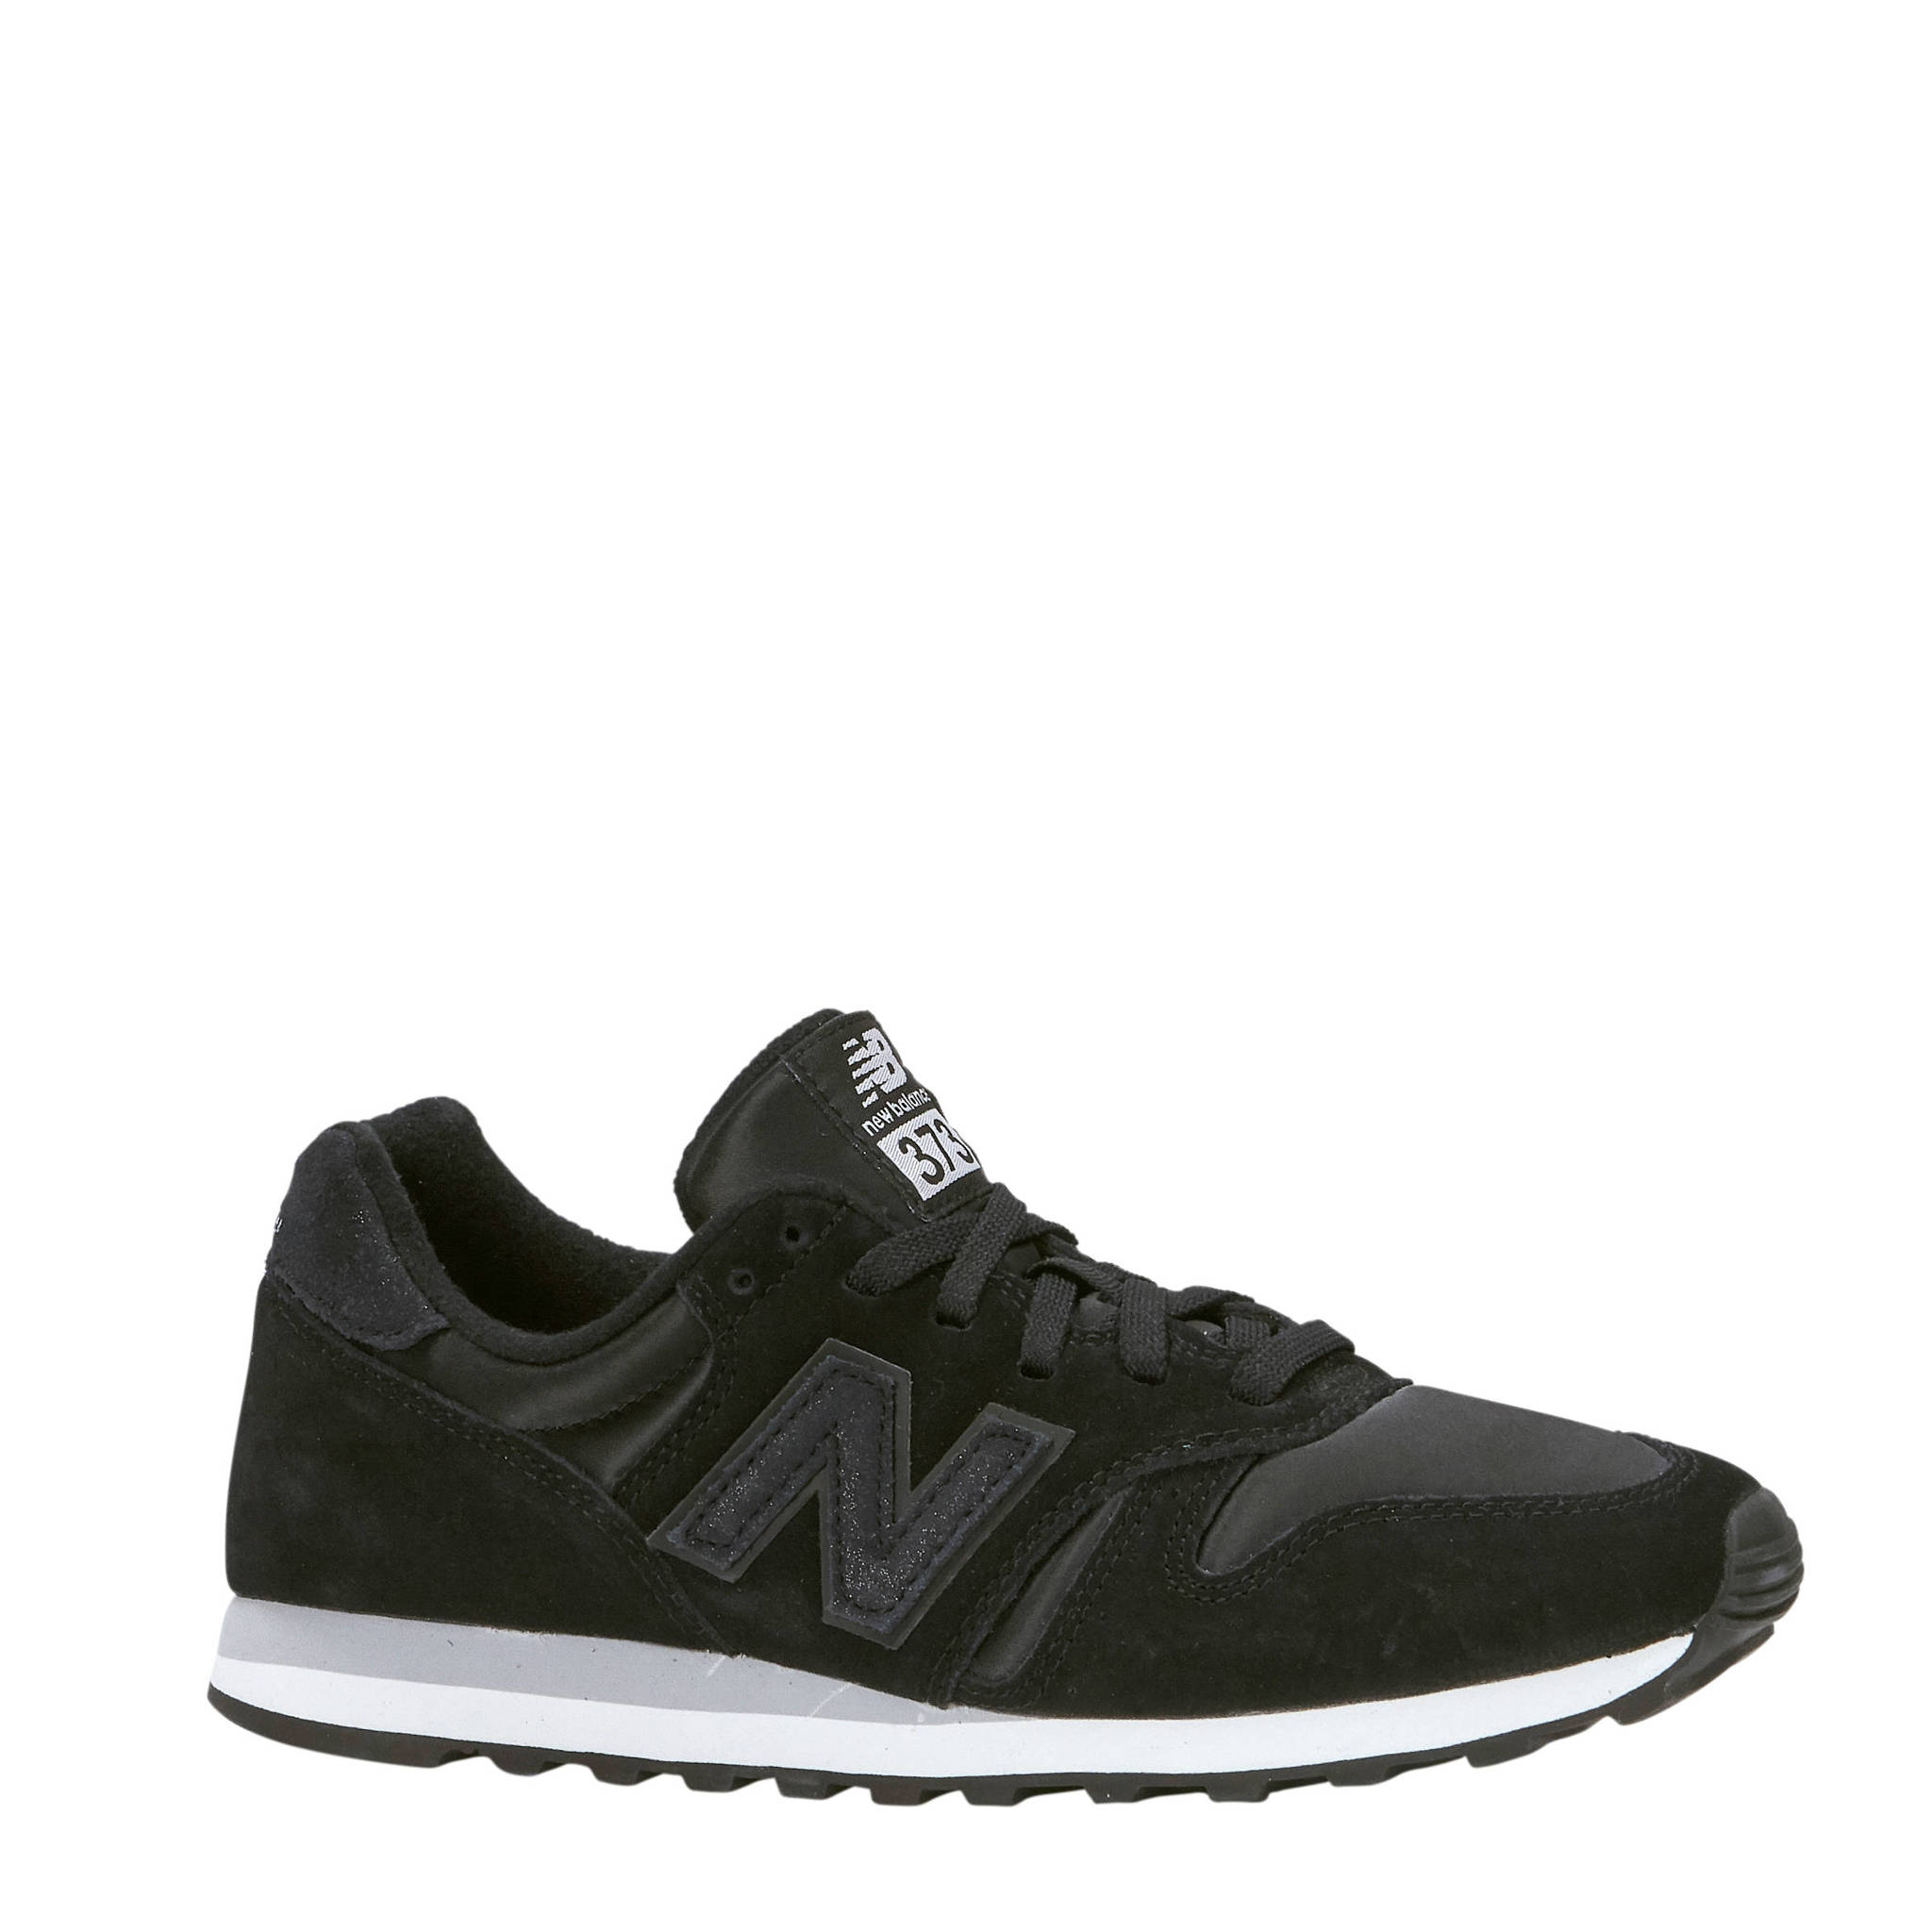 4b5eb1e2834 New Balance 373 sneakers   wehkamp